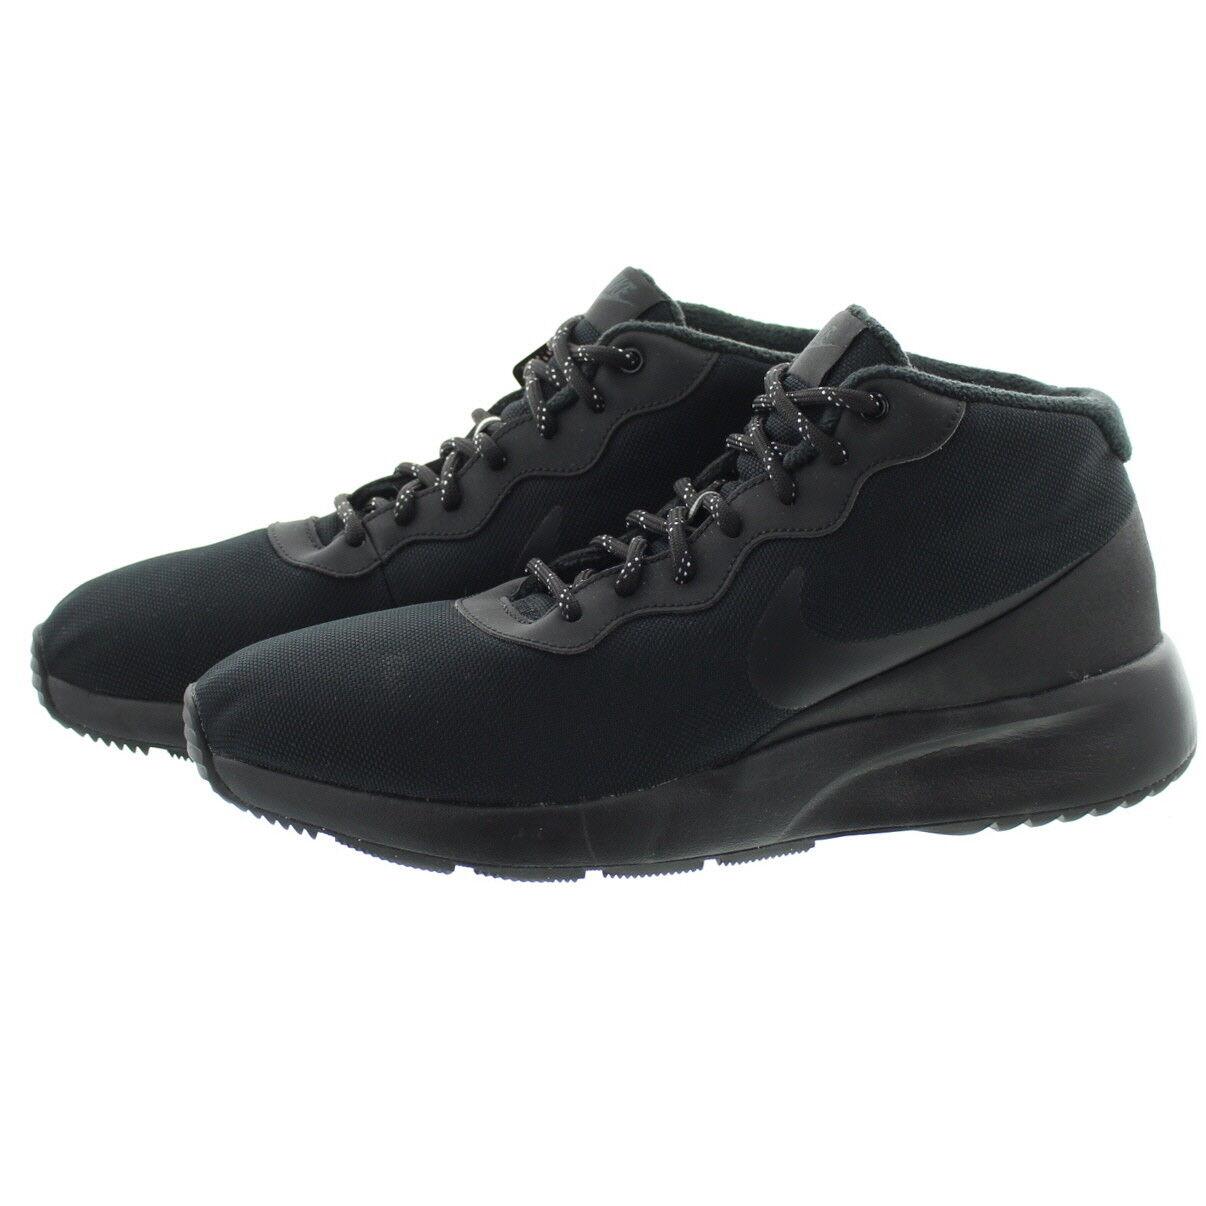 Nike 858655 Mens Tanjun Chukka Mid Top Running Athletic Training Sneakers shoes